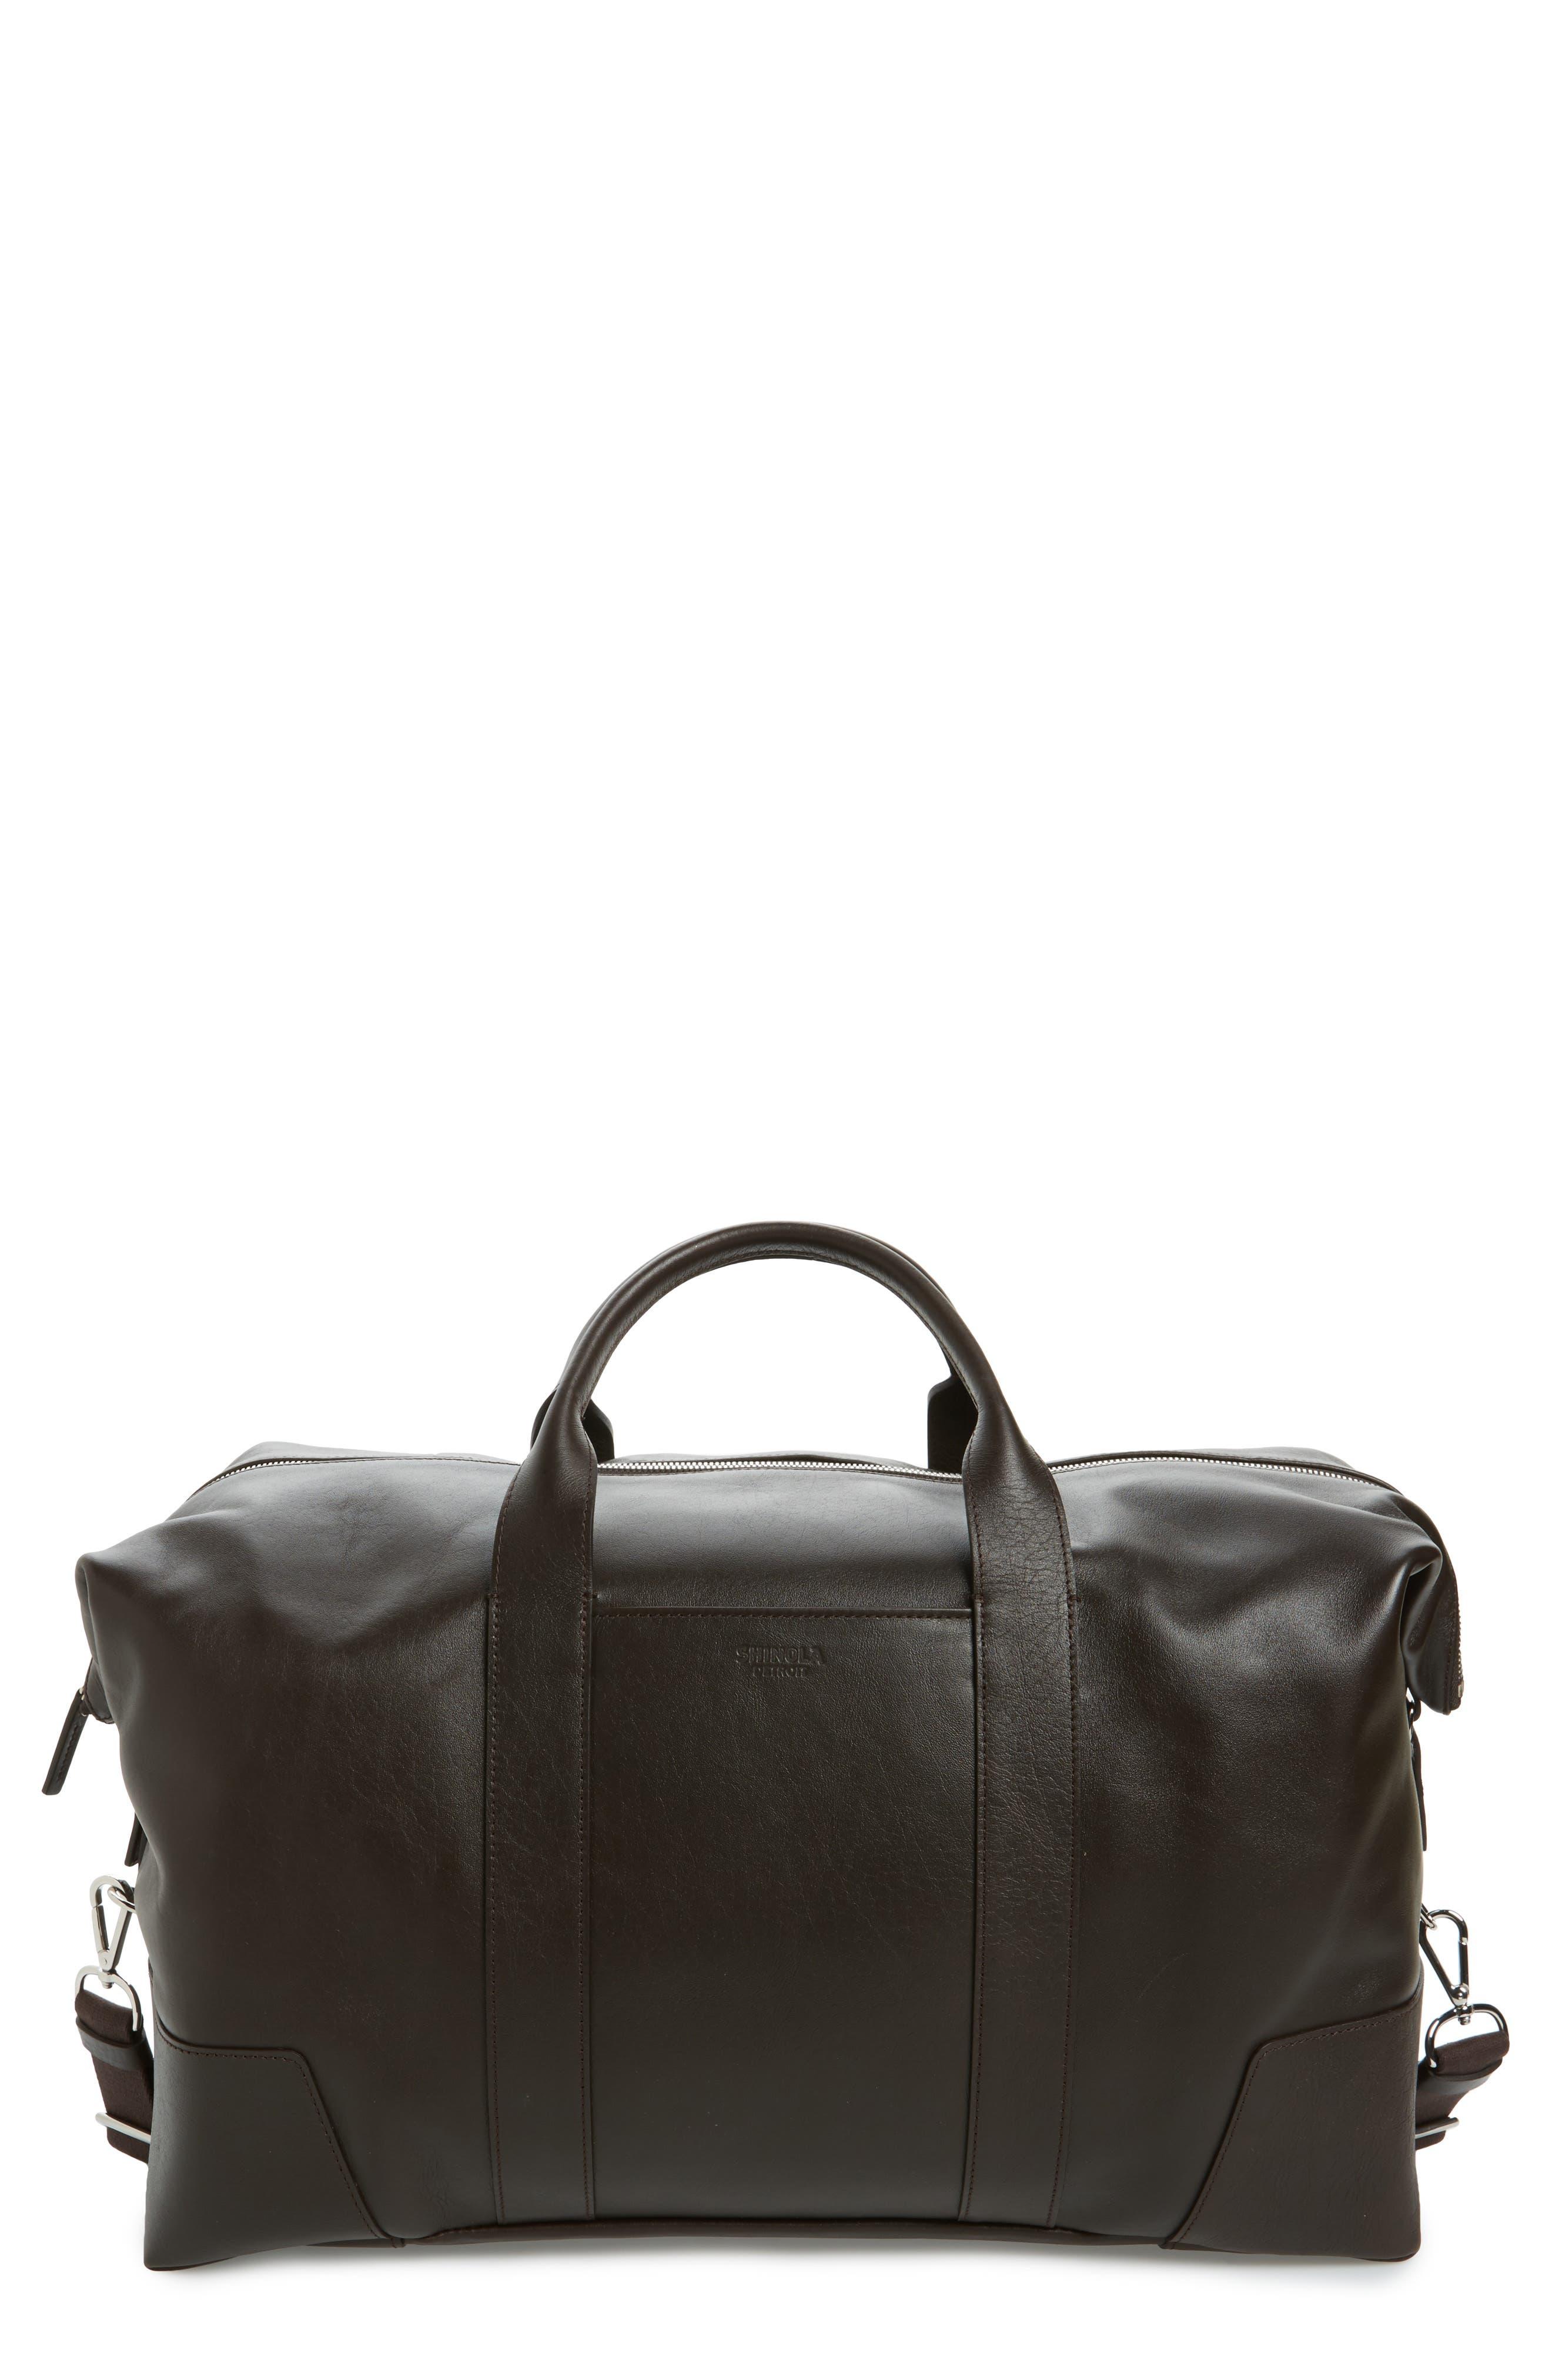 Signature Leather Duffel Bag,                             Main thumbnail 1, color,                             DEEP BROWN